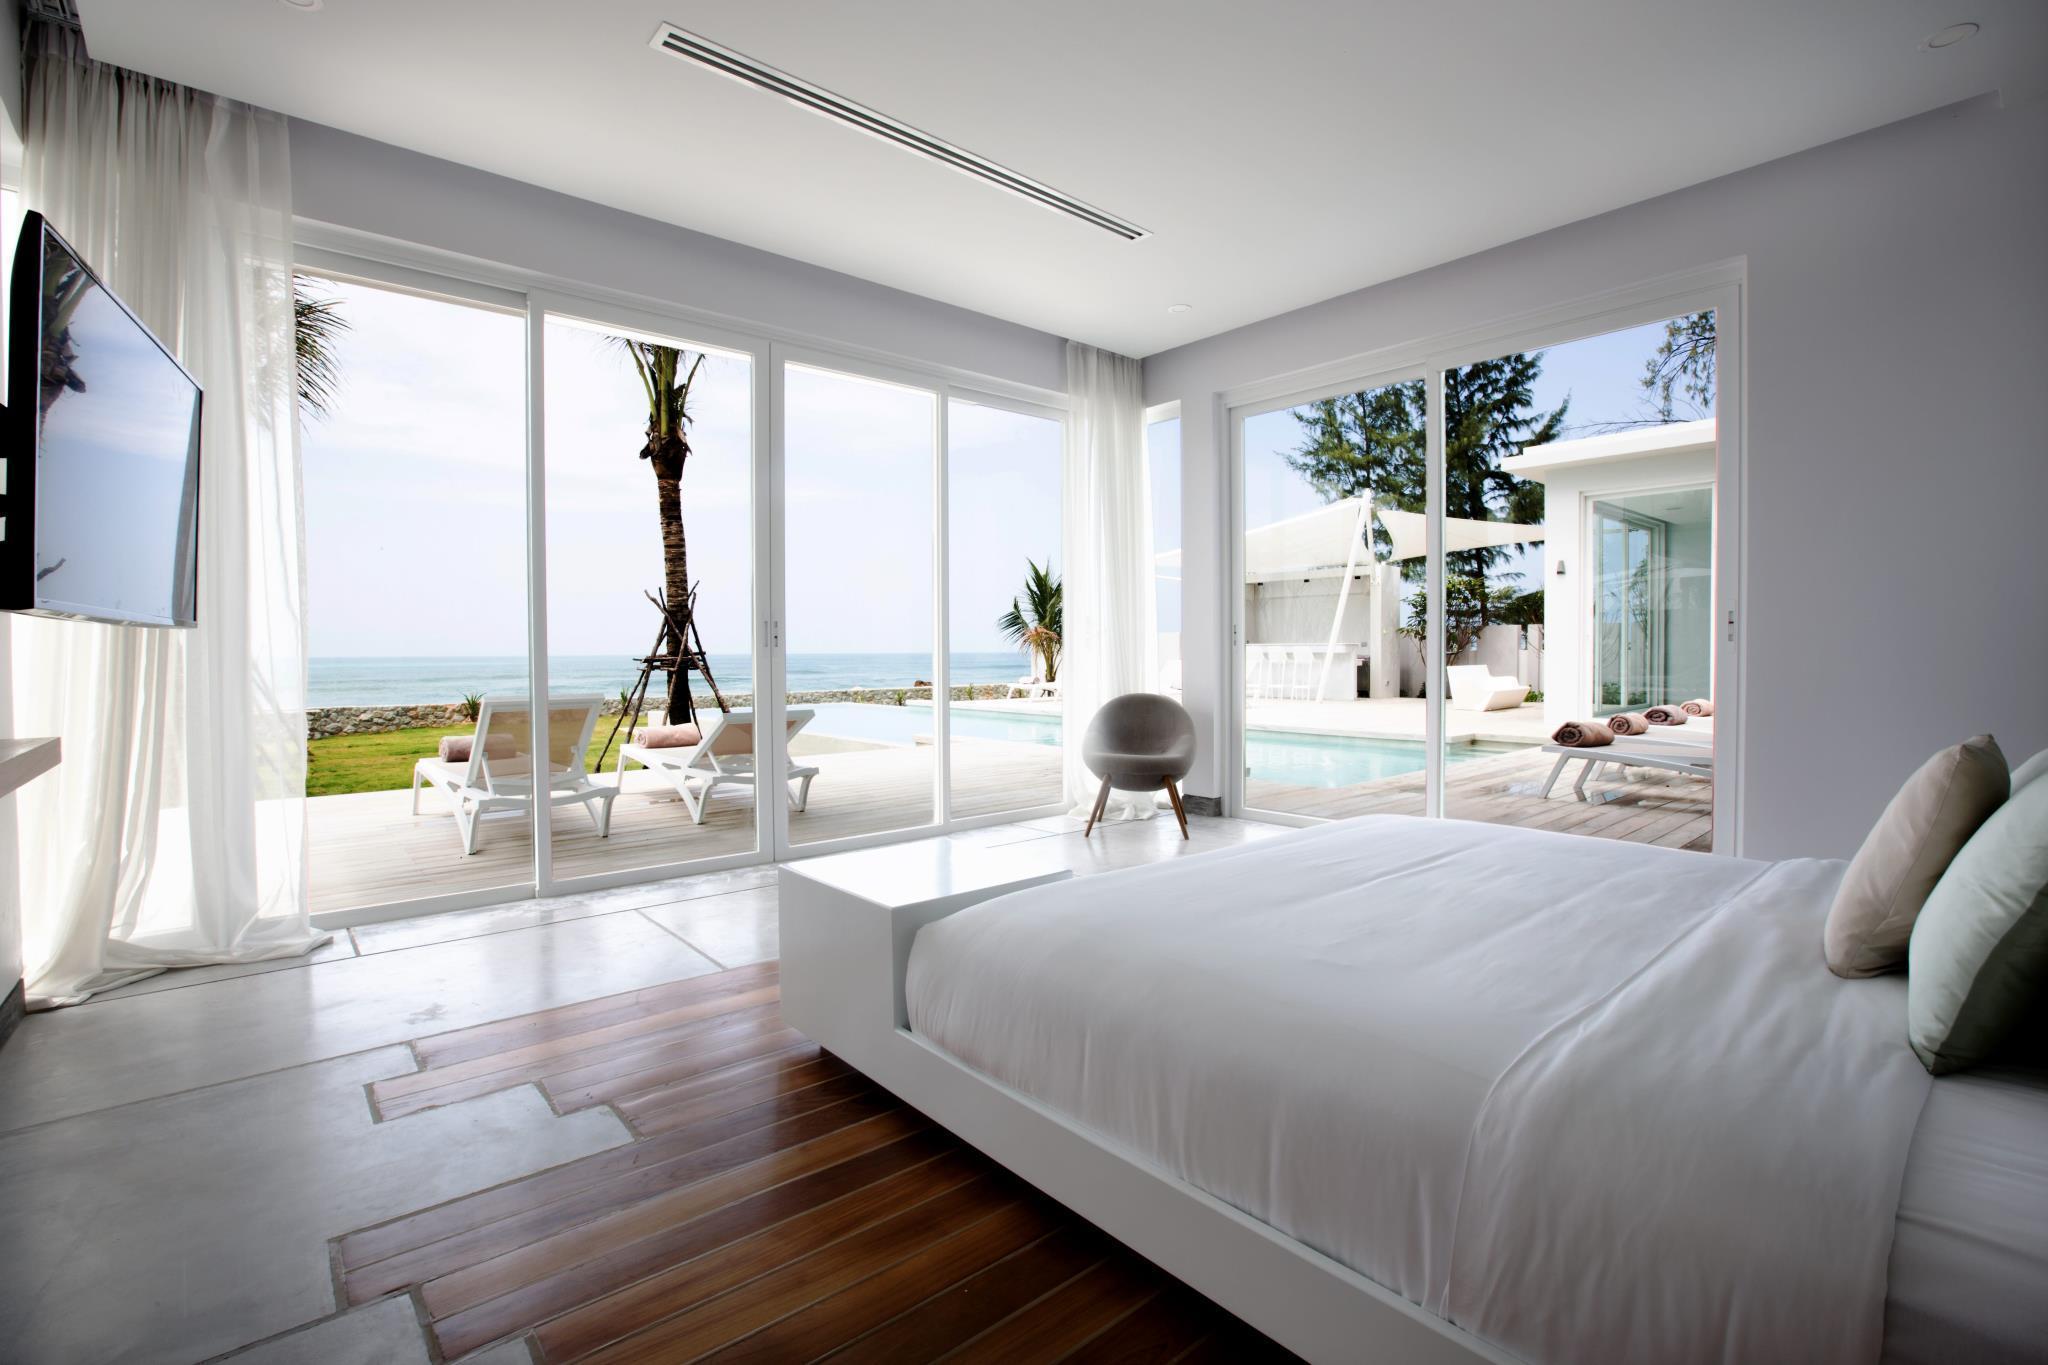 Emejing Iniala Luxus Villa Am Strand A Cero Gallery - Amazing Home ...